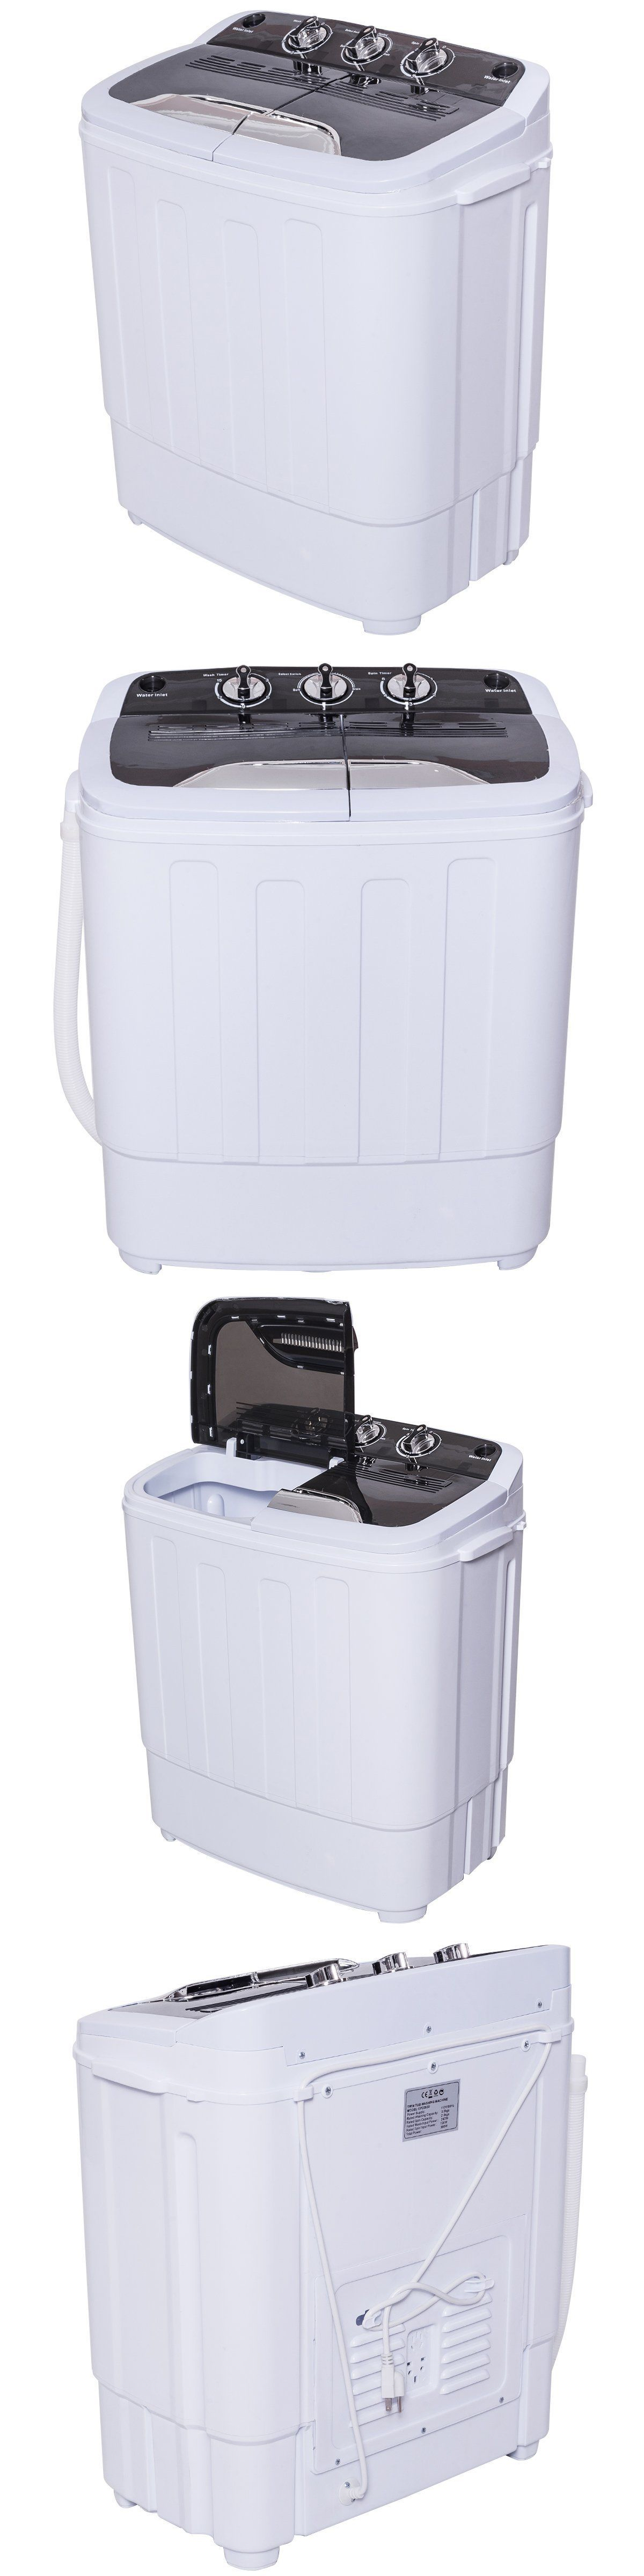 Stunning Apartment Size Washing Machines Contemporary - Decorating ...